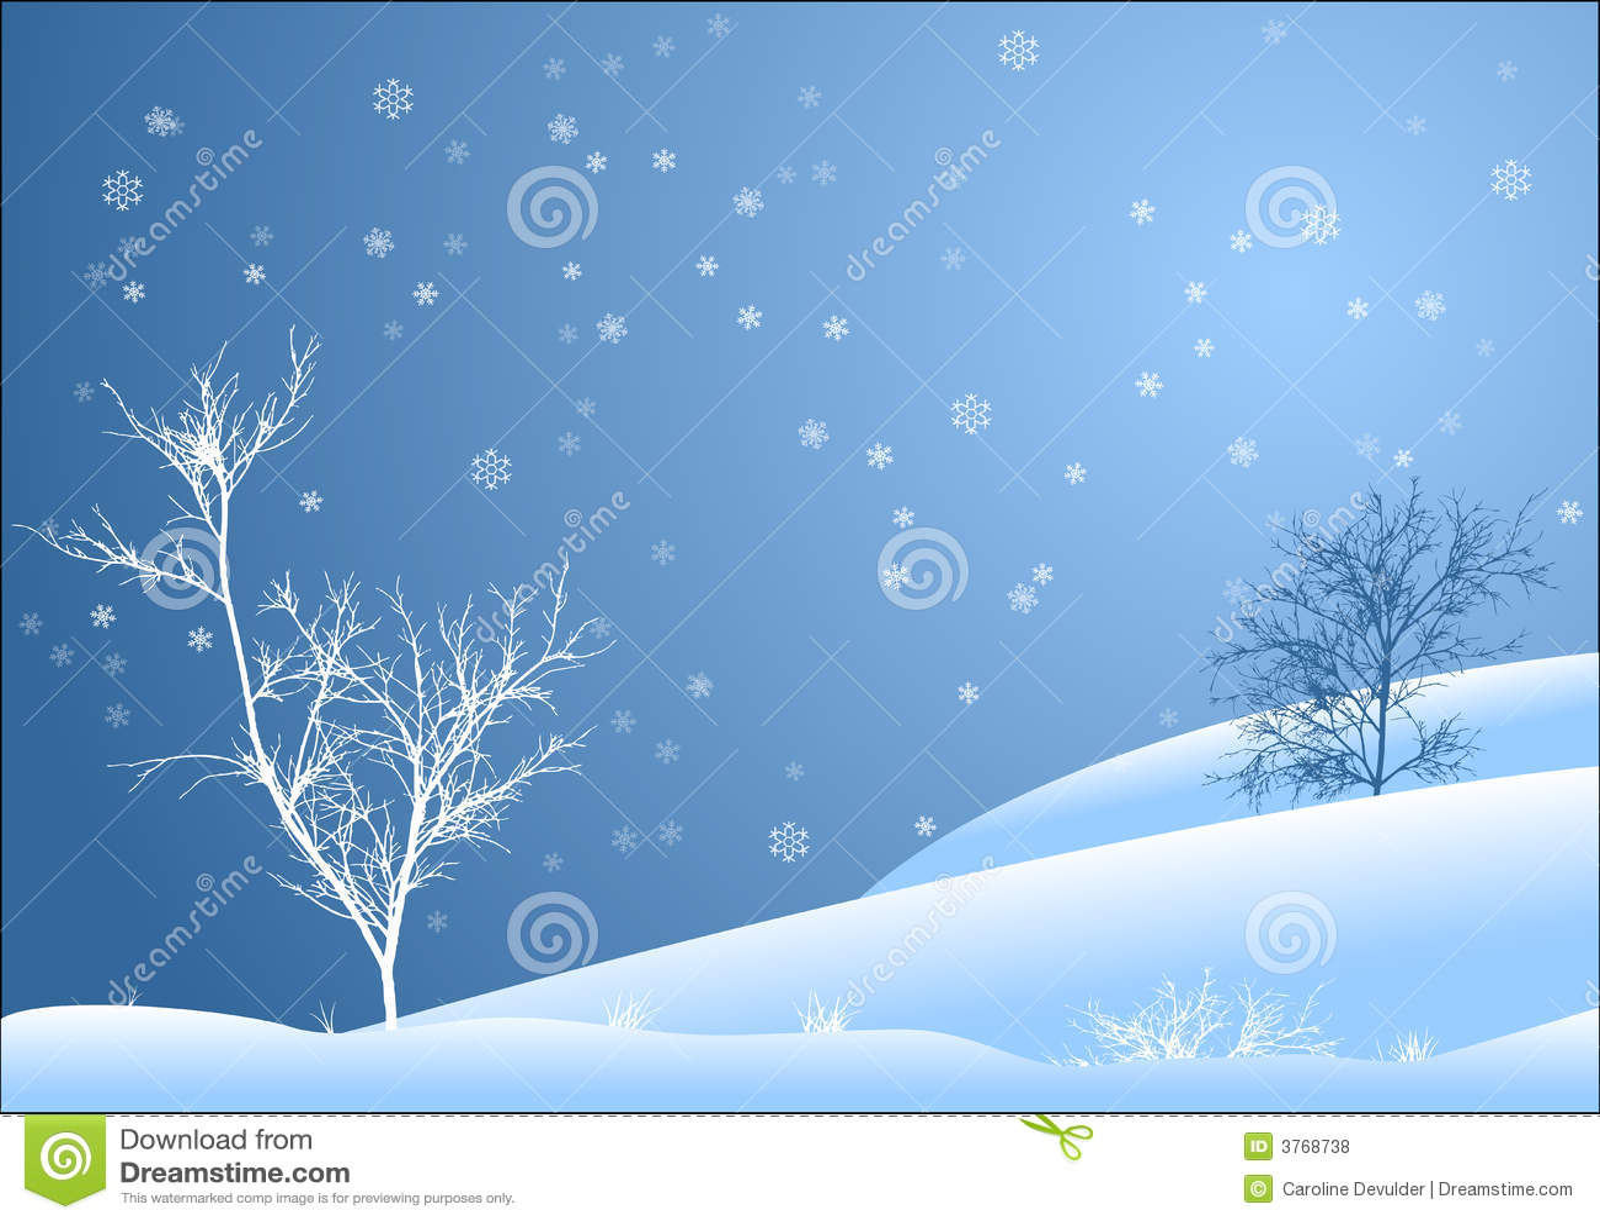 Paisaje nevado fotos de archivo libres de regal as - Paisaje nevado navidad ...